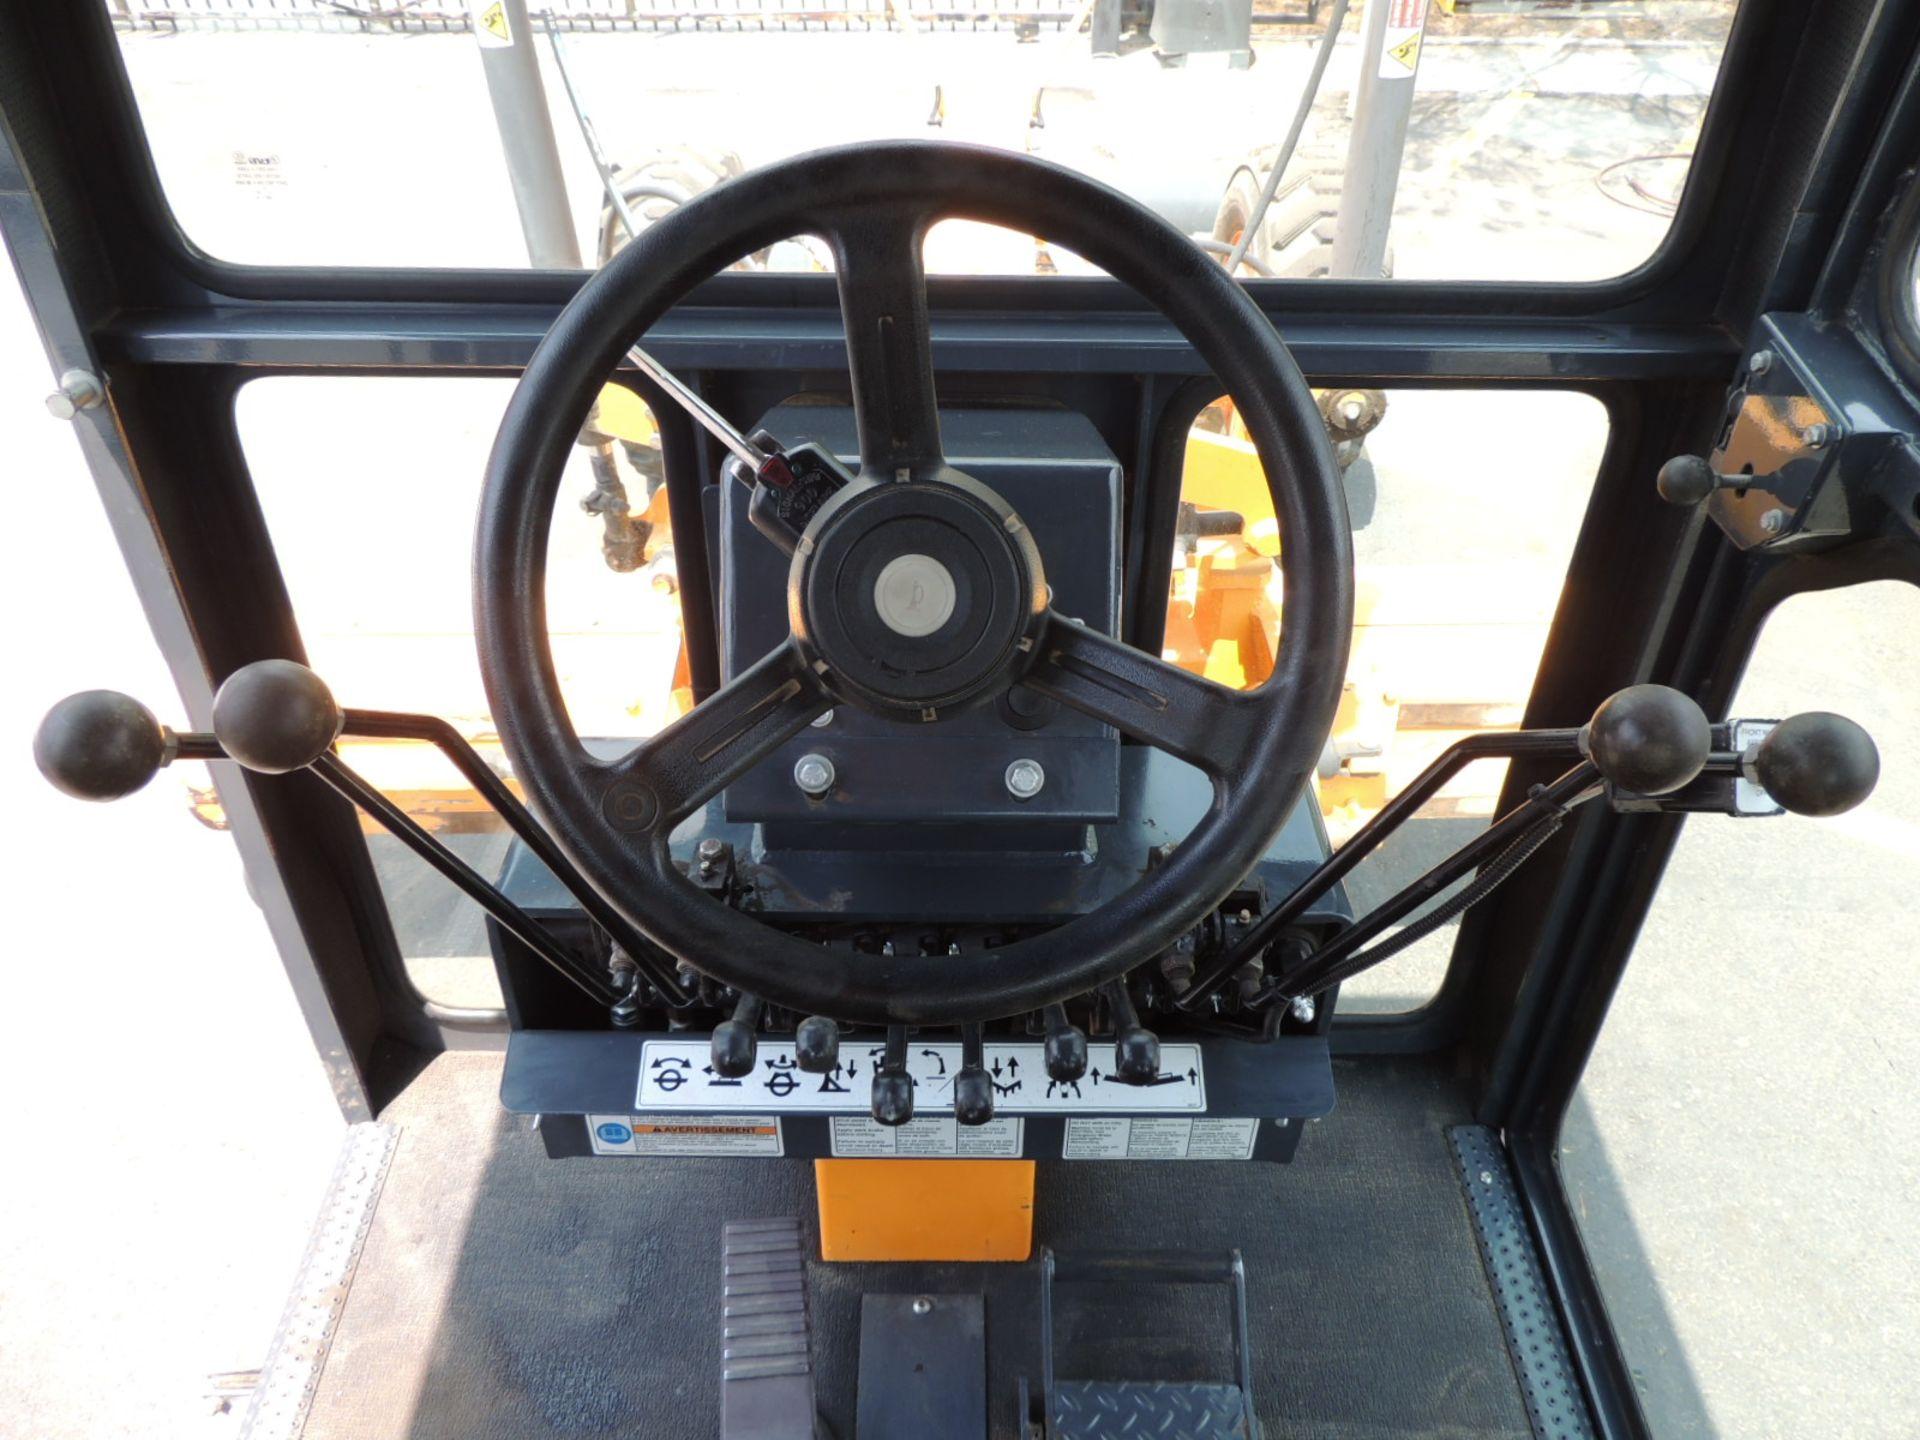 2015 Leeboy 685C Motor Grader, S/N 11909, Rear Ripper w/9-Shank Bar, Includes (5) Shanks, Front - Image 11 of 11